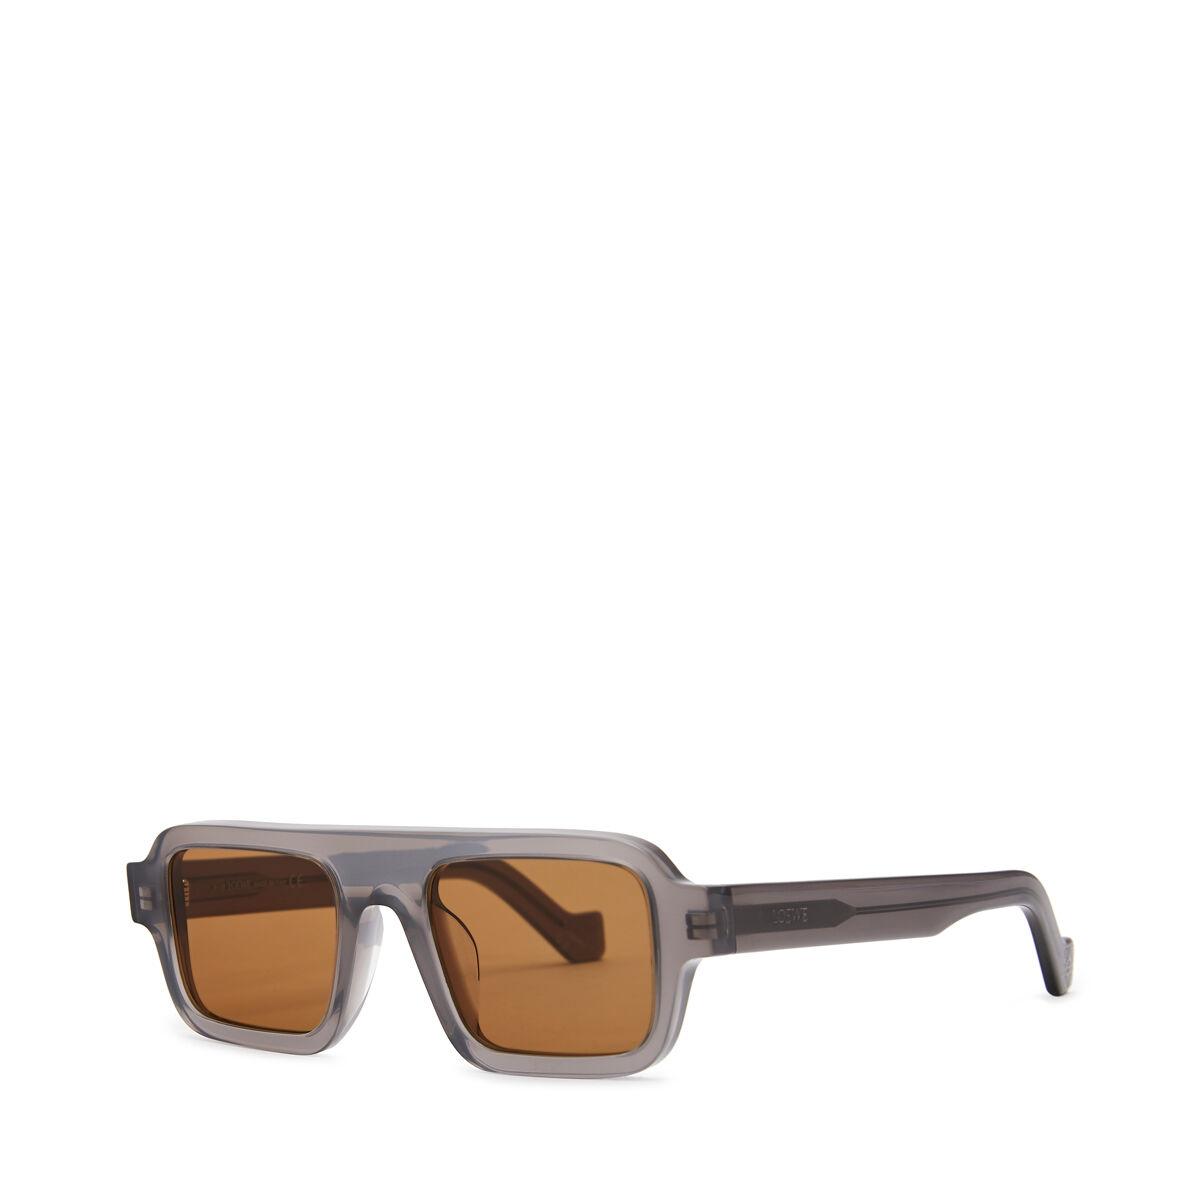 LOEWE Square Sunglasses Grey front